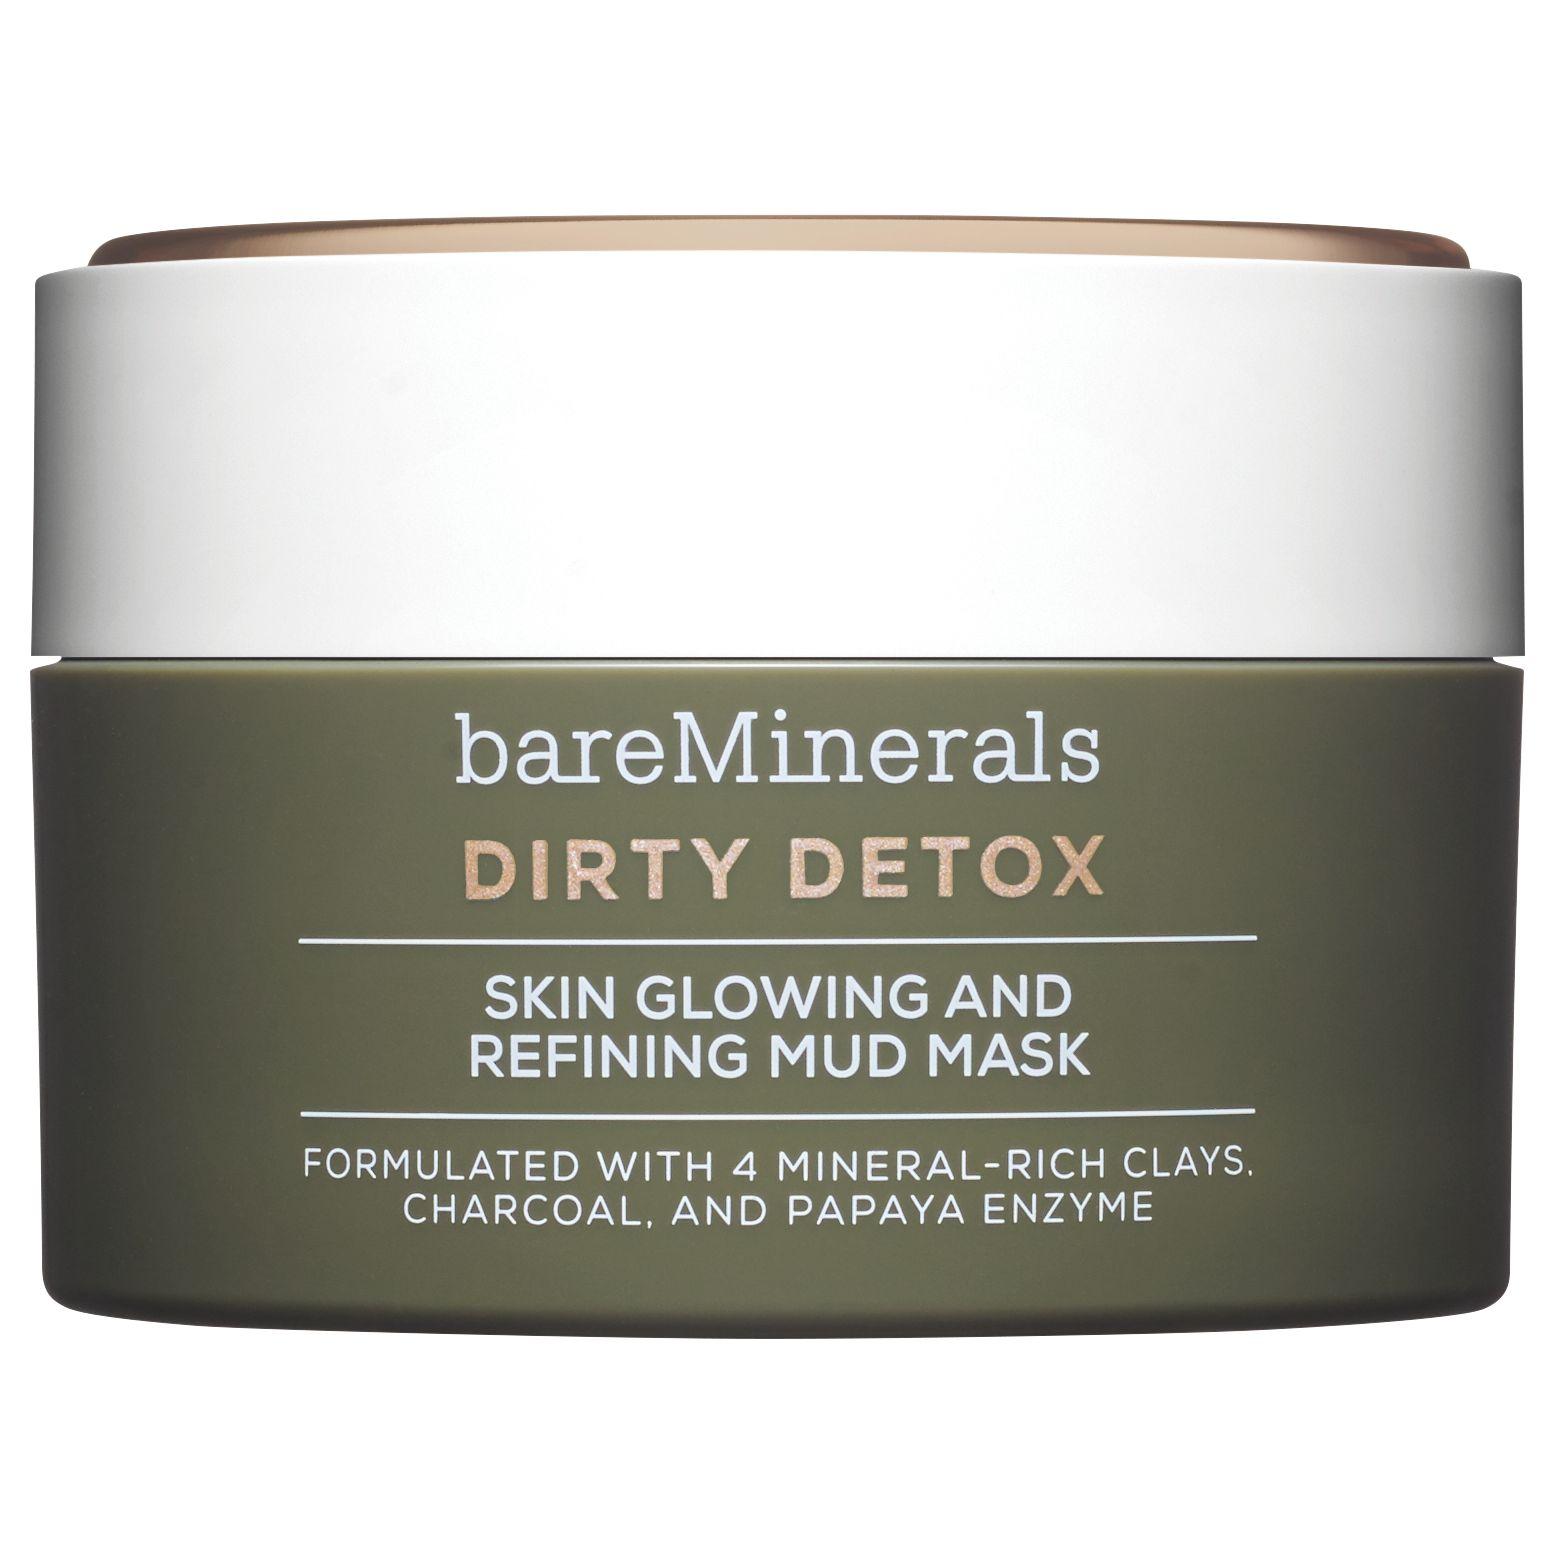 bareMinerals bareMinerals DIRTY DETOX™ Skin Glowing & Refining Mud Mask, 58g